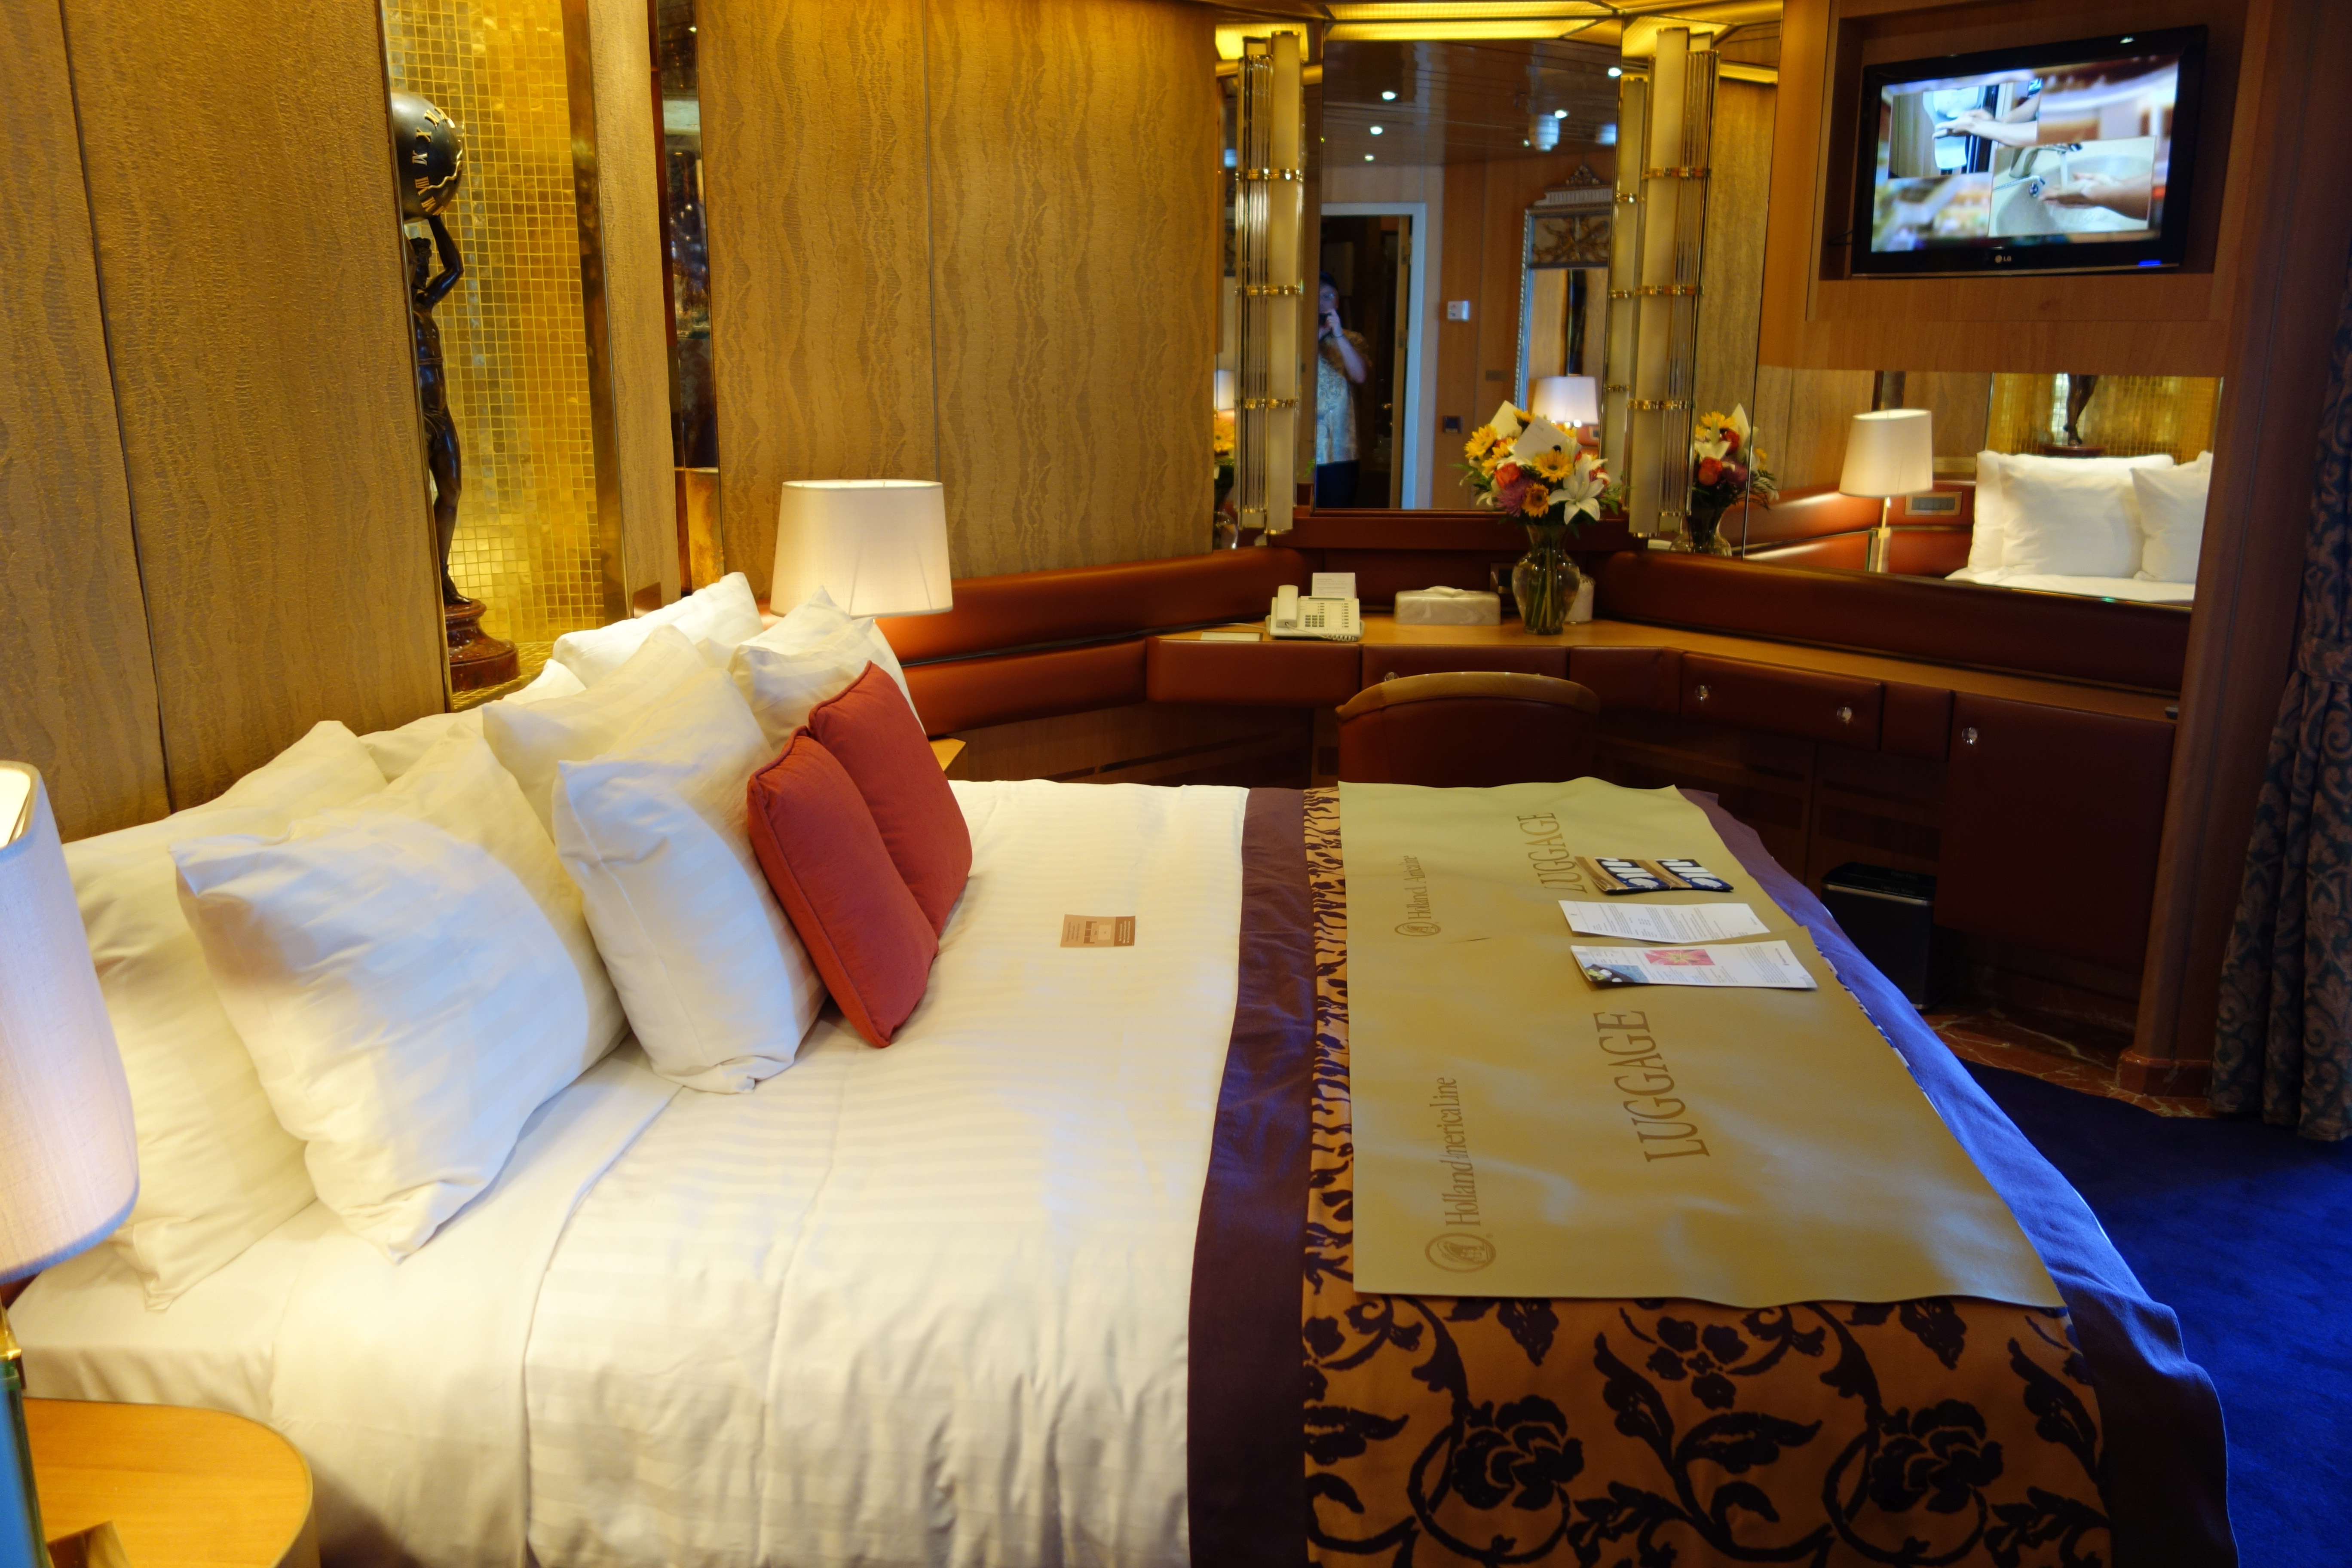 Holland America Still A Very Good Cruise Line Zaandam Cruise Review